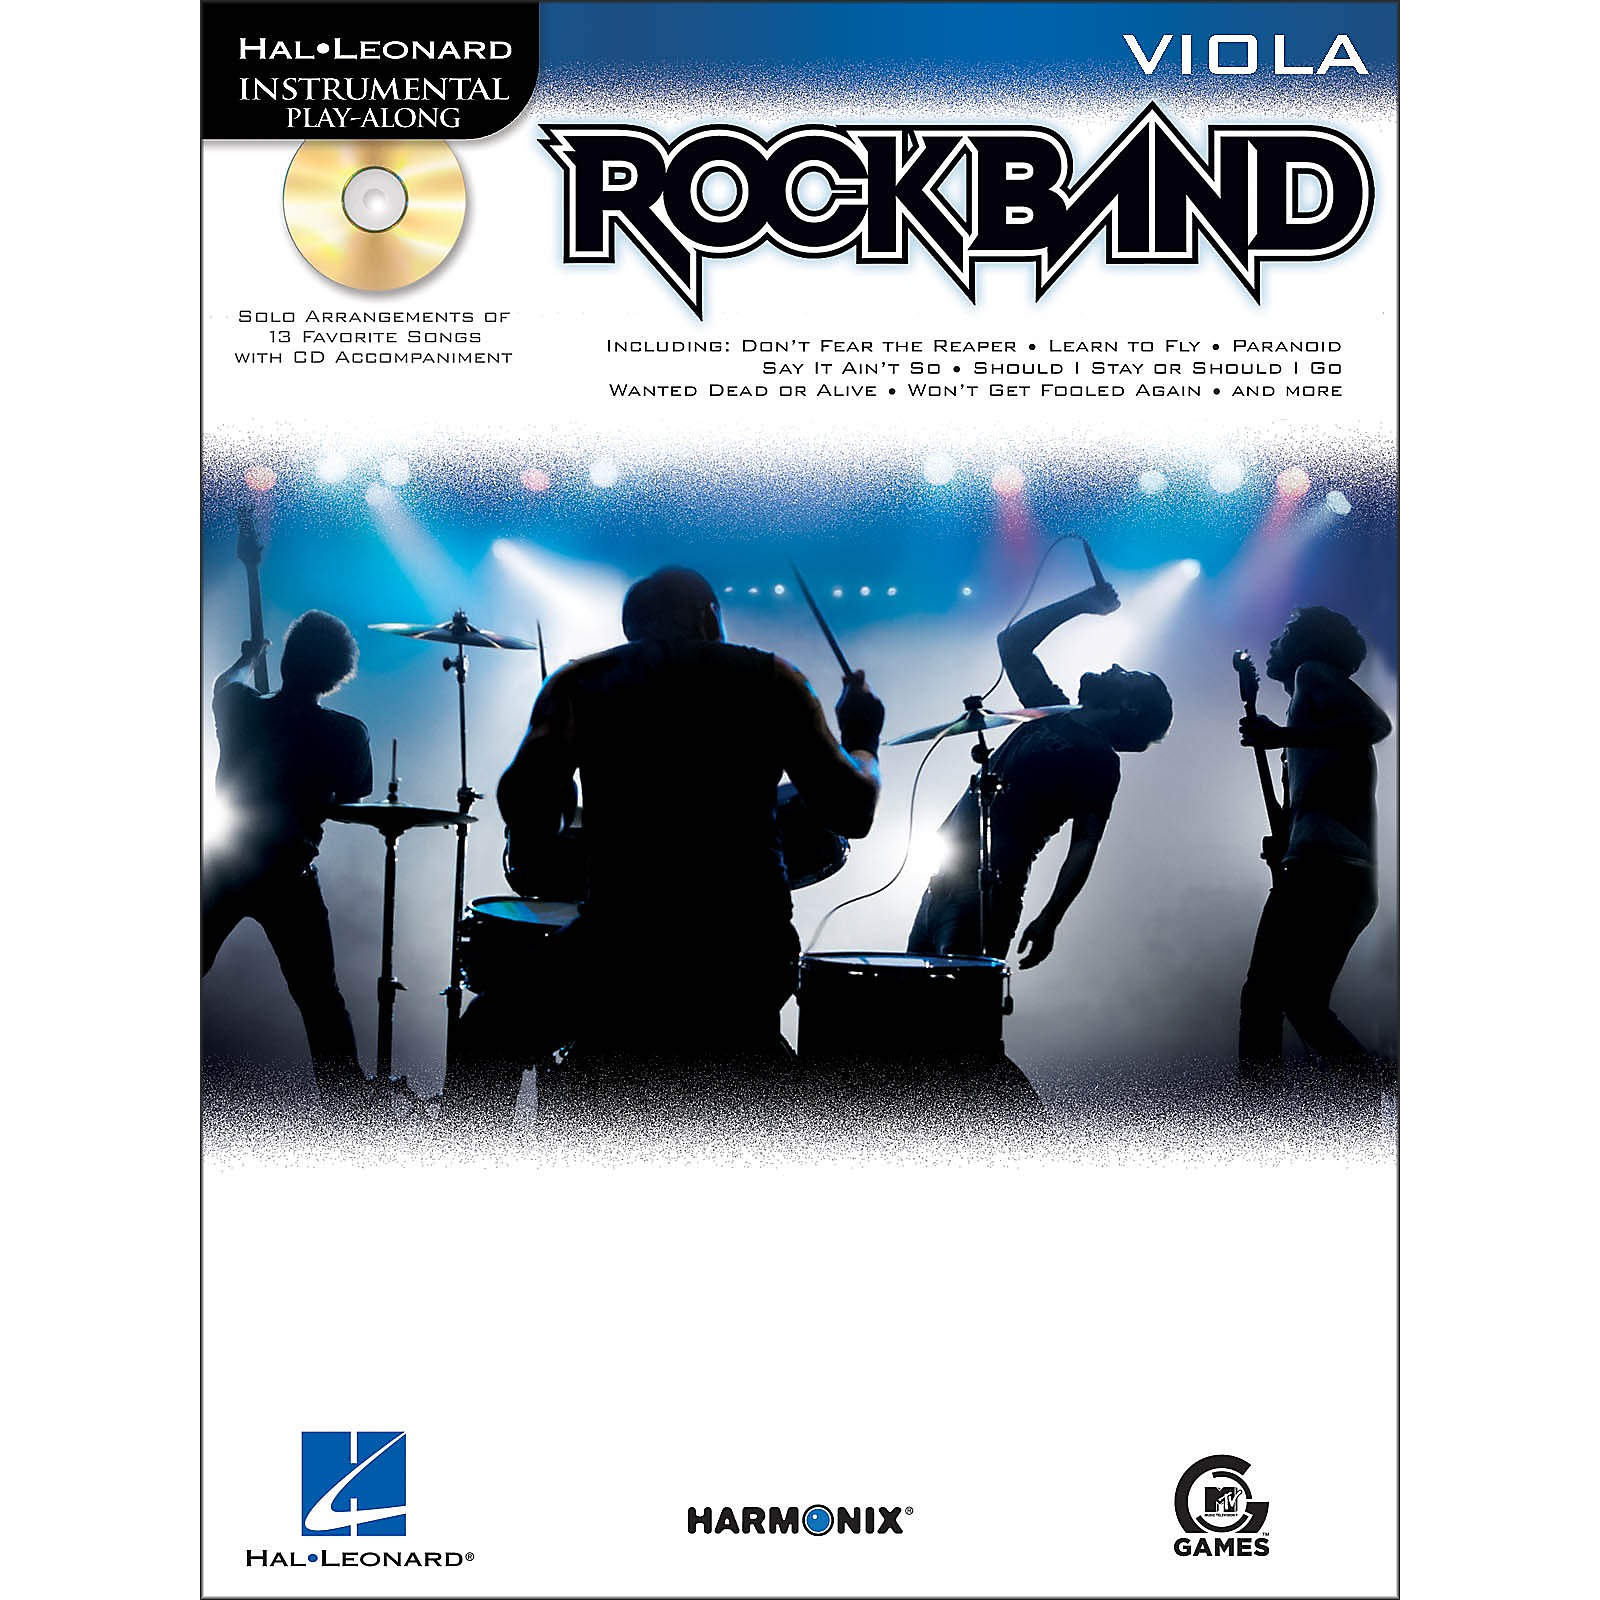 Hal Leonard Rock Band for Viola Instrumental Play-Along Book/CD